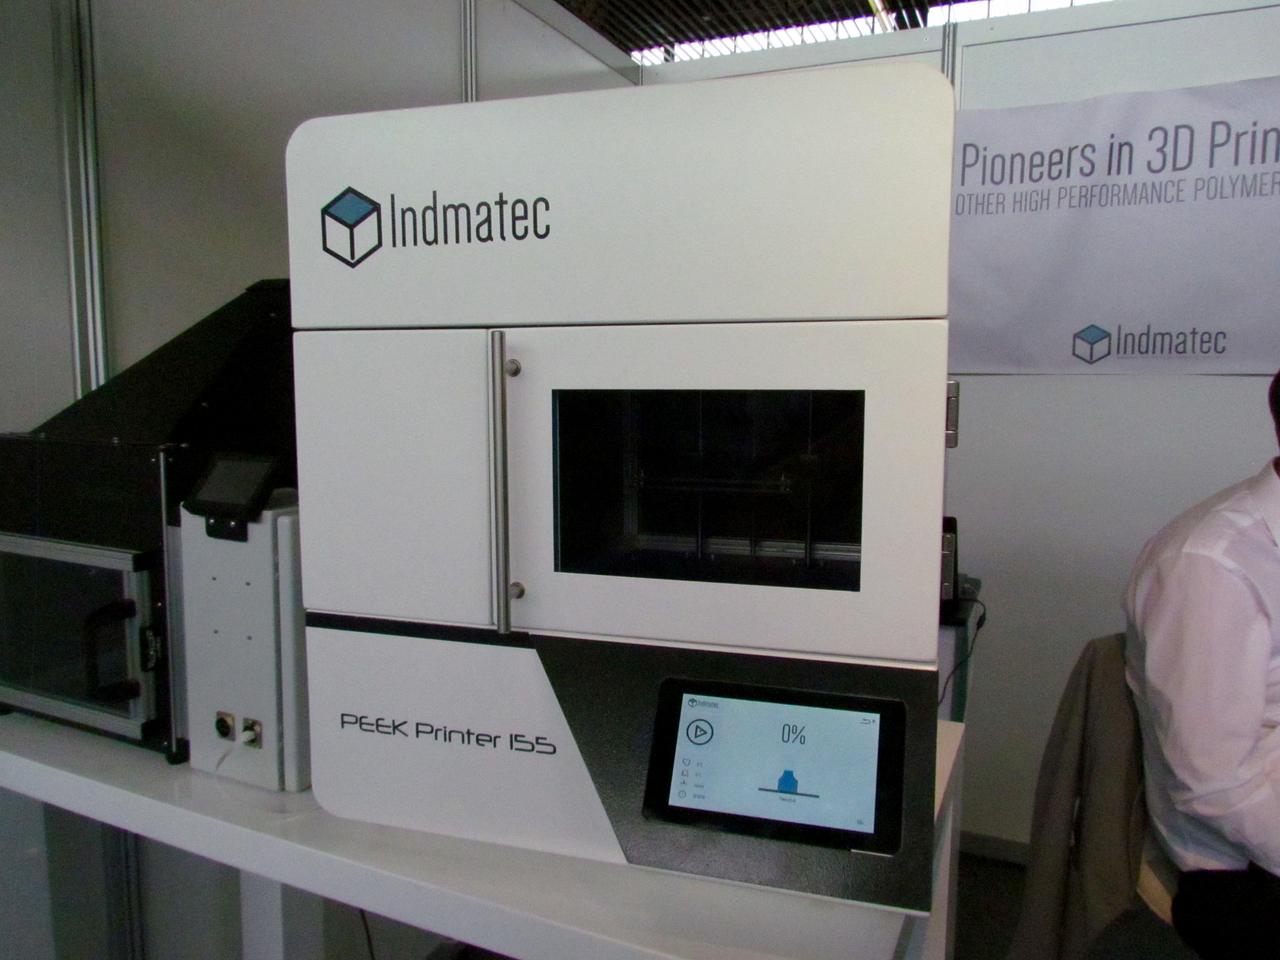 Indmatec Reaches Beyond 3D Printing Mere PEEK